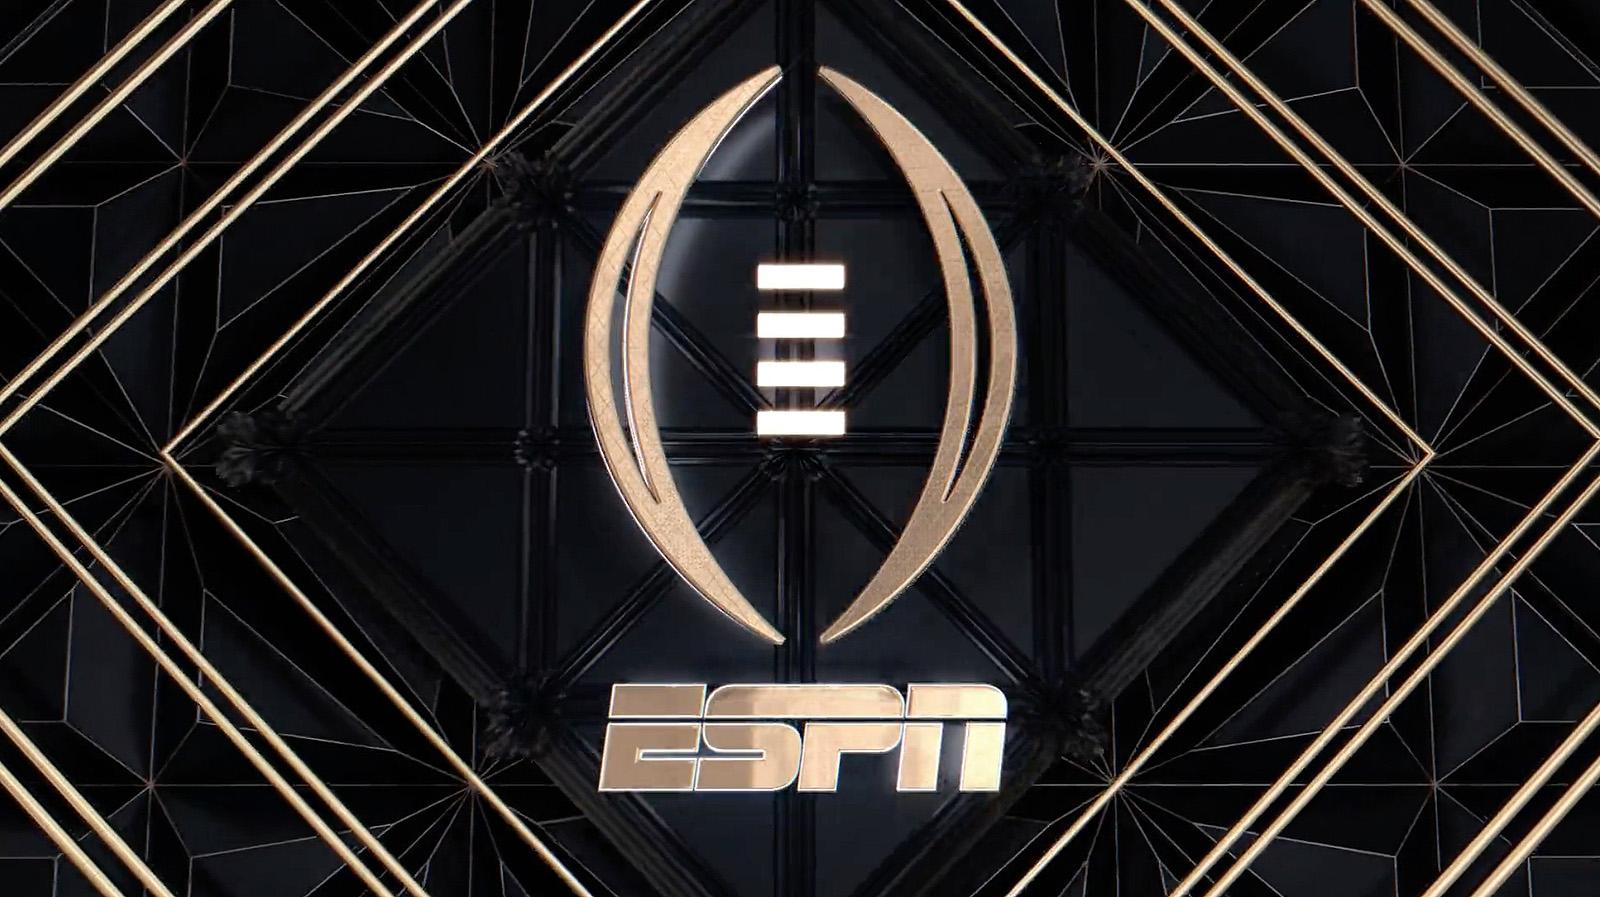 NCS_ESPN-College-Football-Playoffs-Troika_001